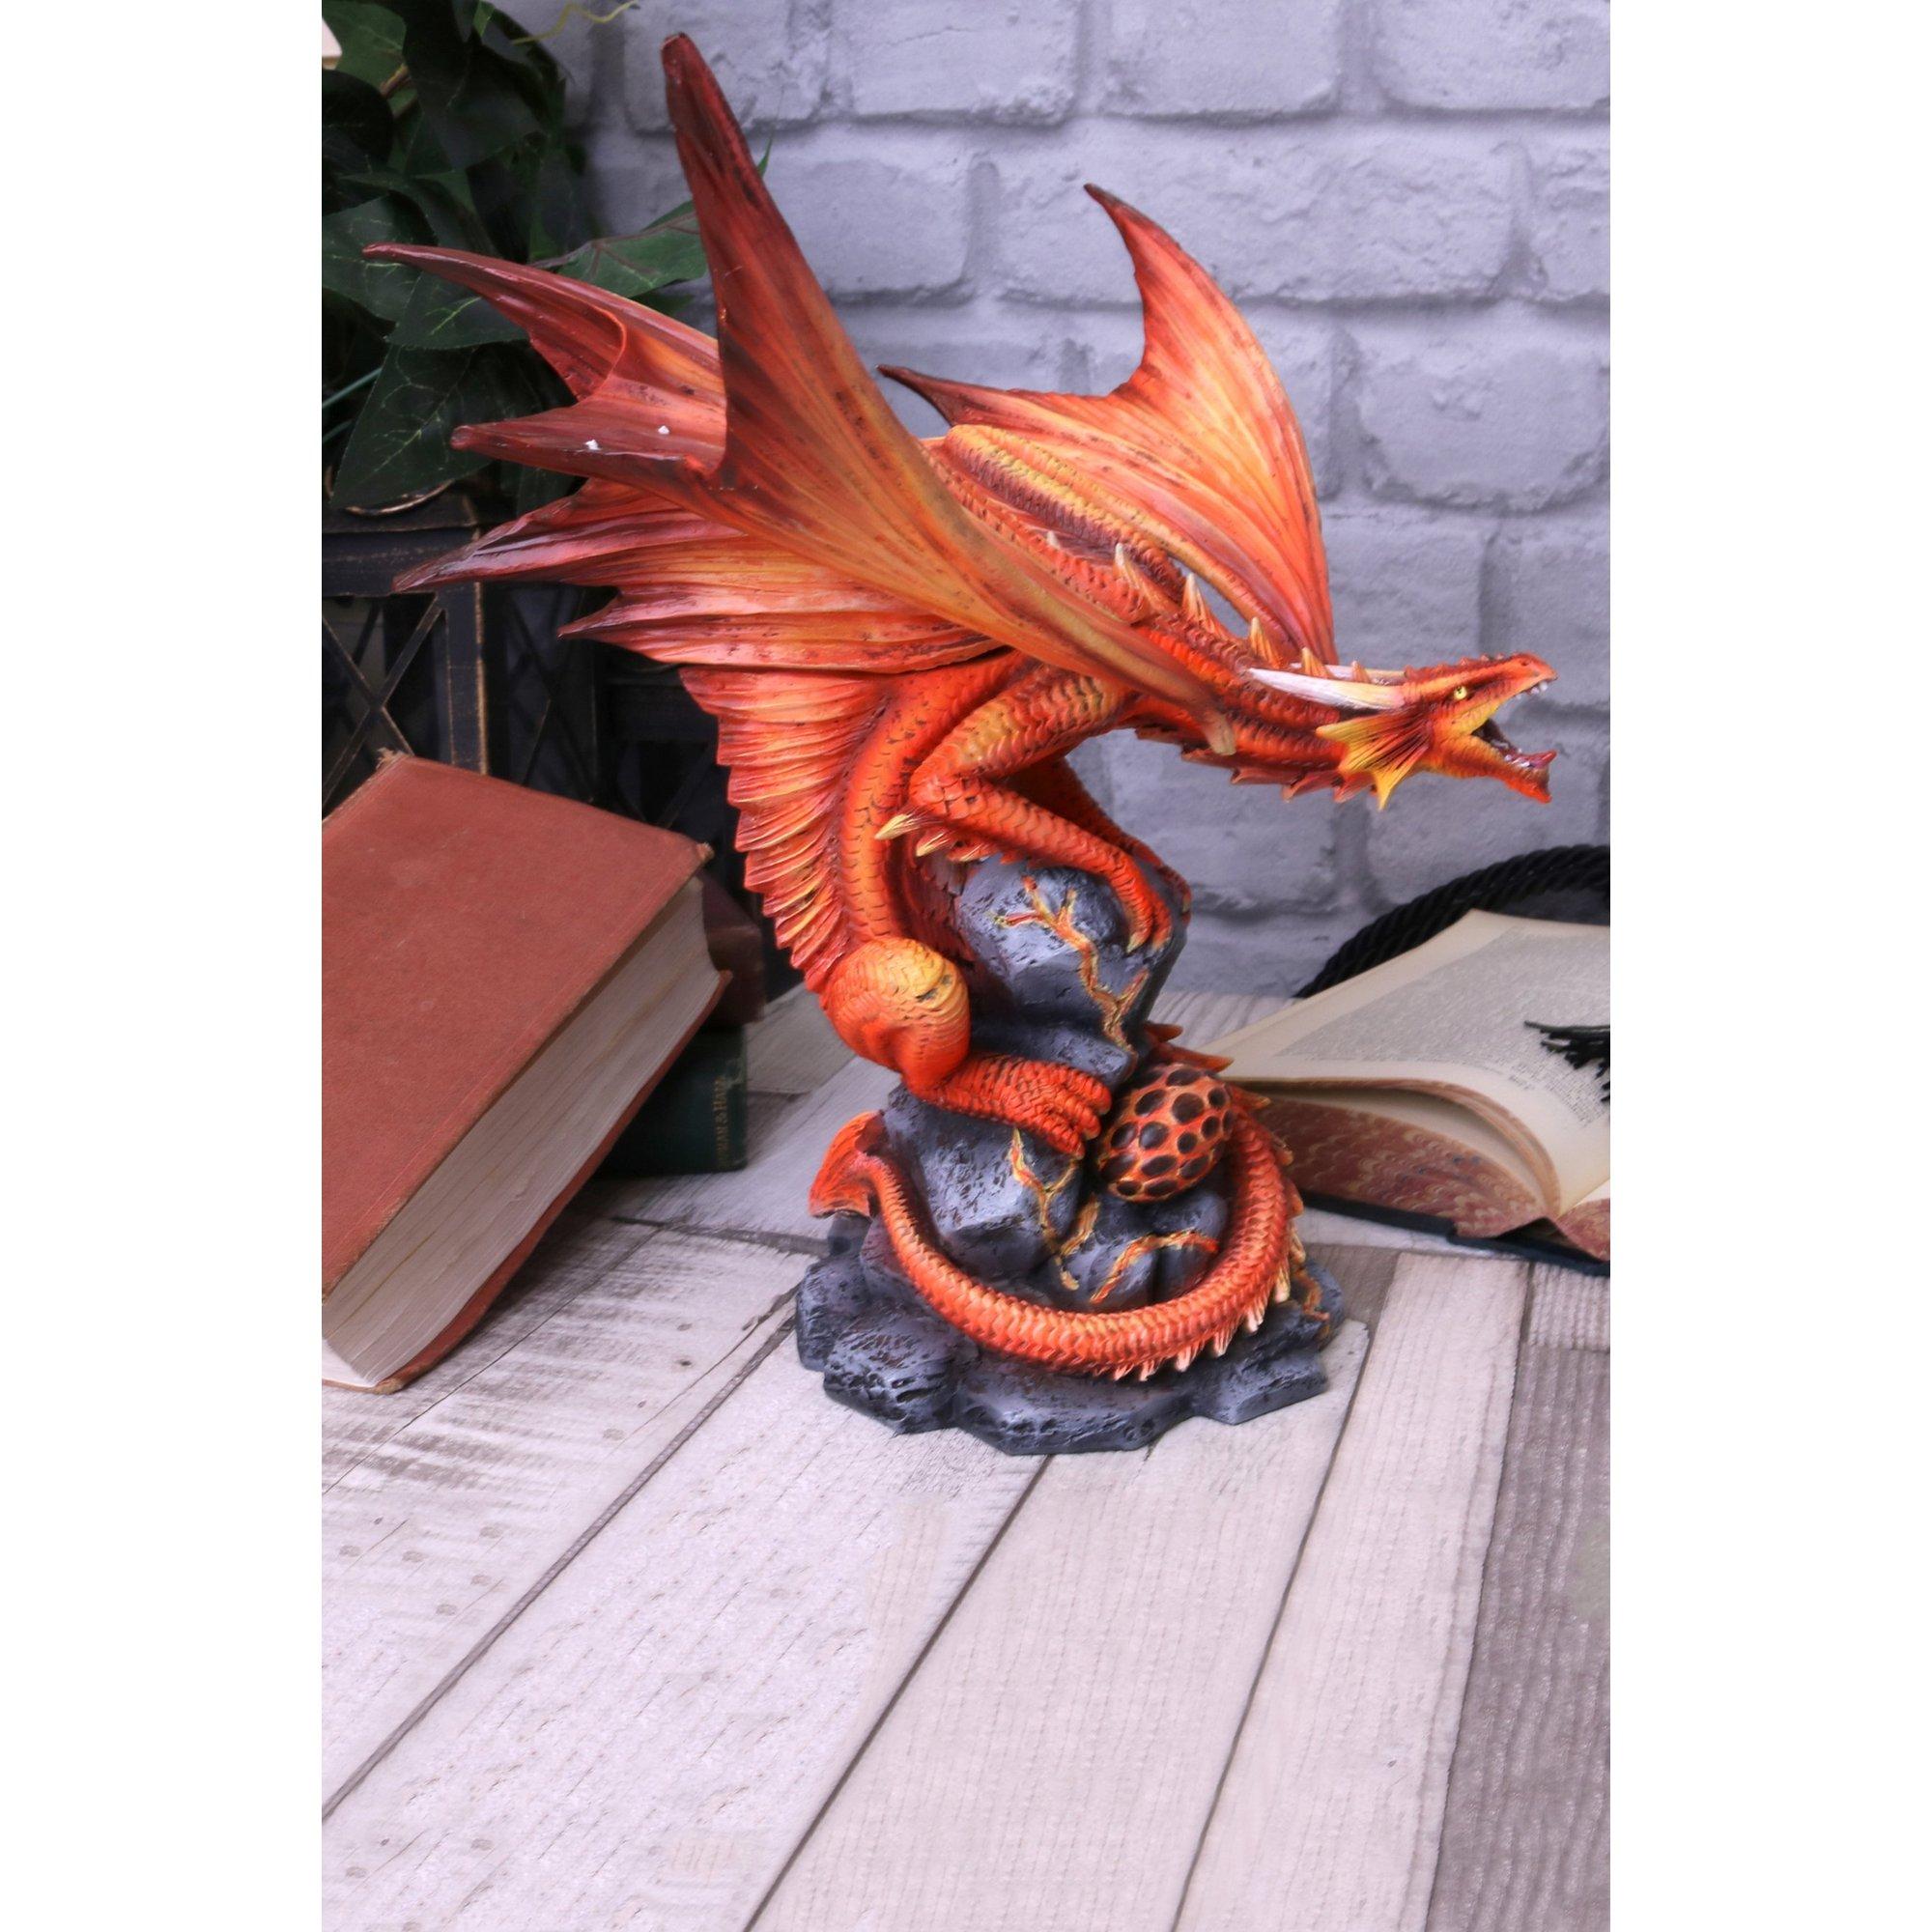 Image of Adult Fire Dragon Figurine